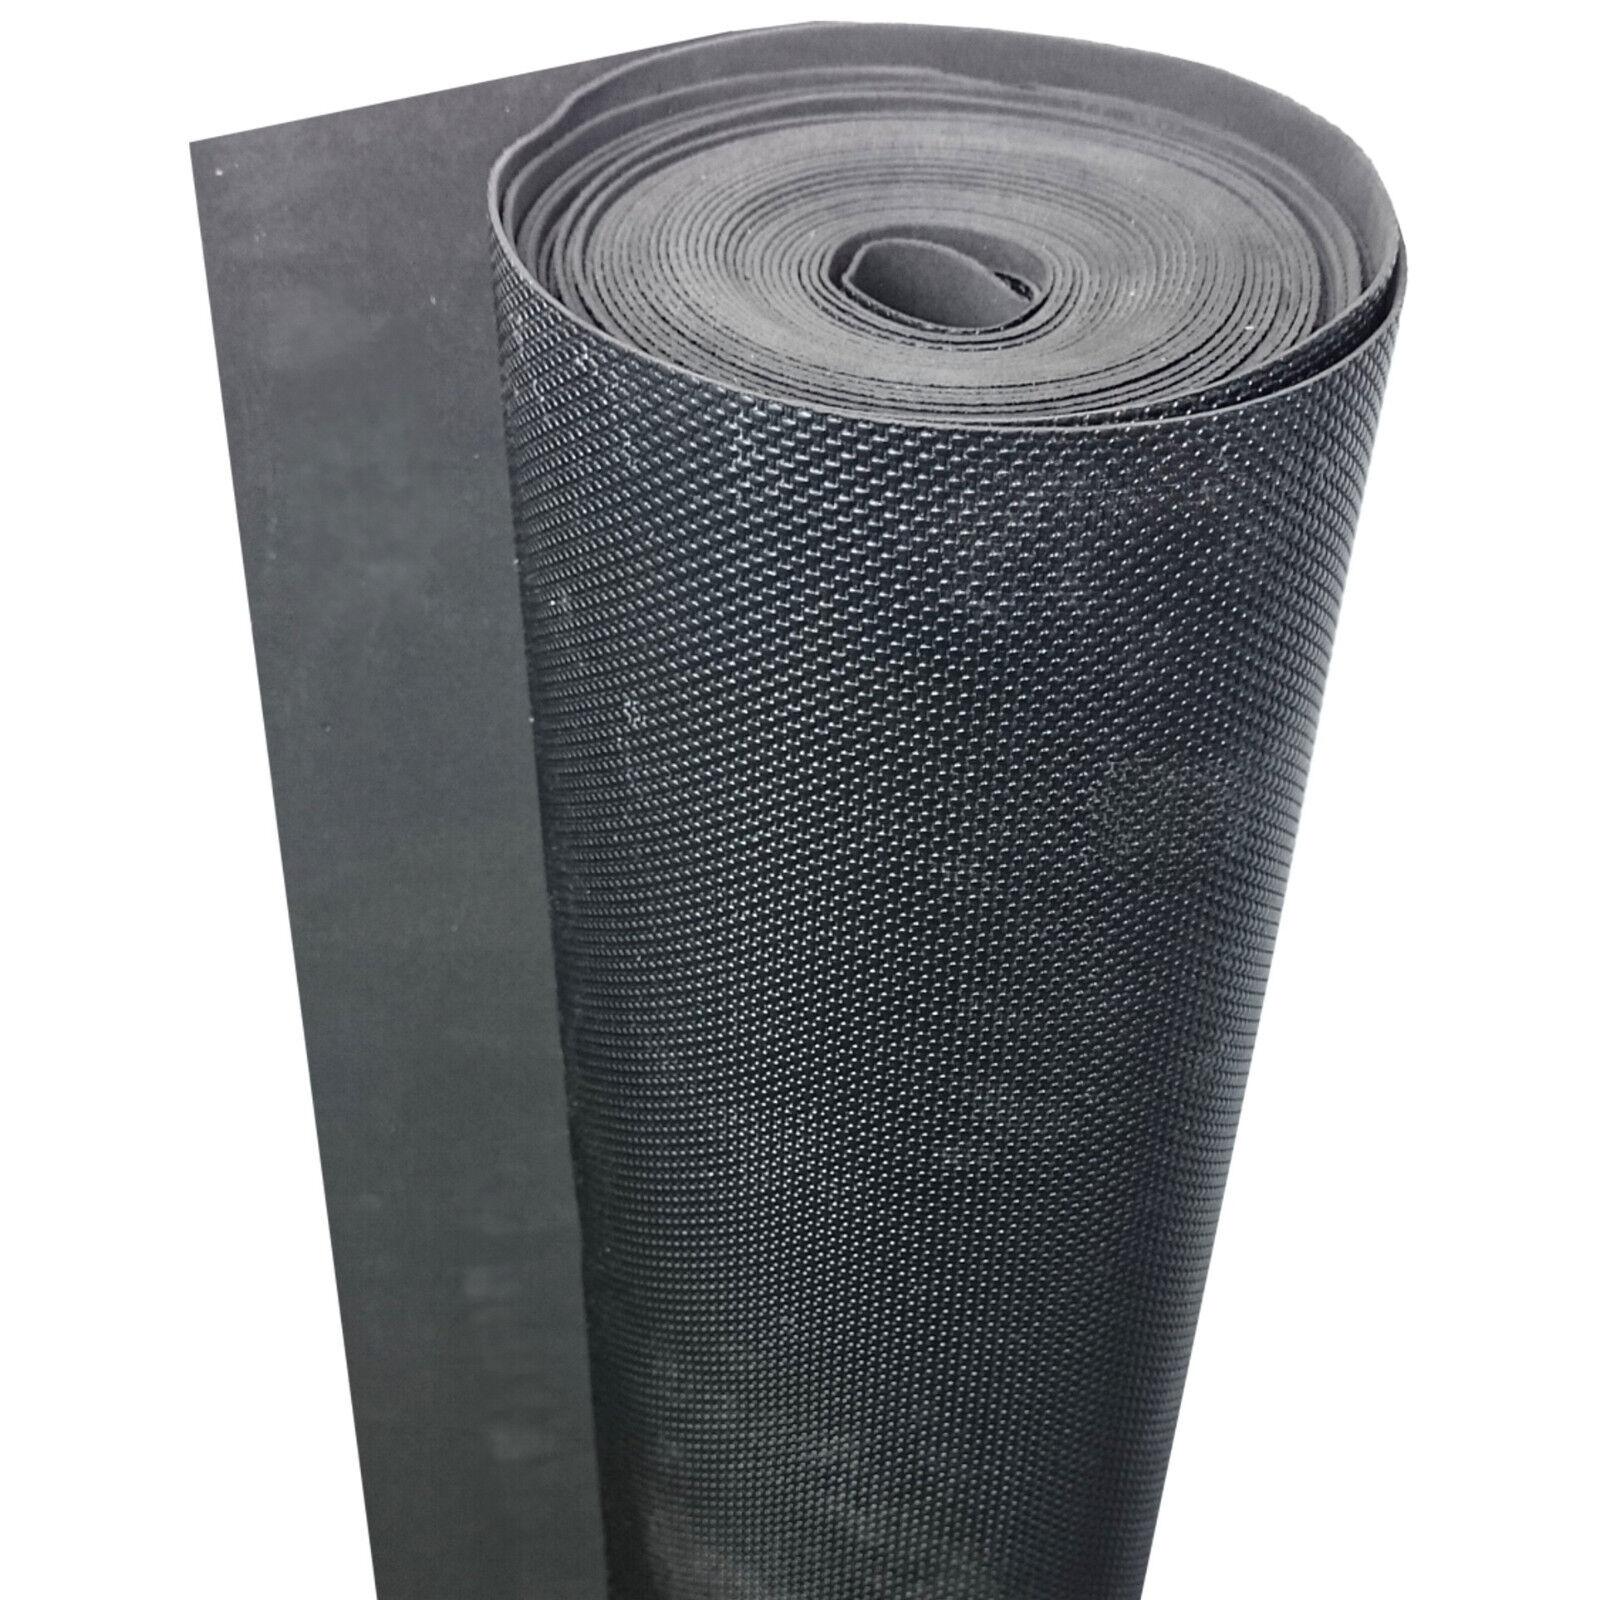 vinyl trittschalld mmung vinosmart 1 5 mm st rke f r click vinyl b den 15 m eur 44 85. Black Bedroom Furniture Sets. Home Design Ideas